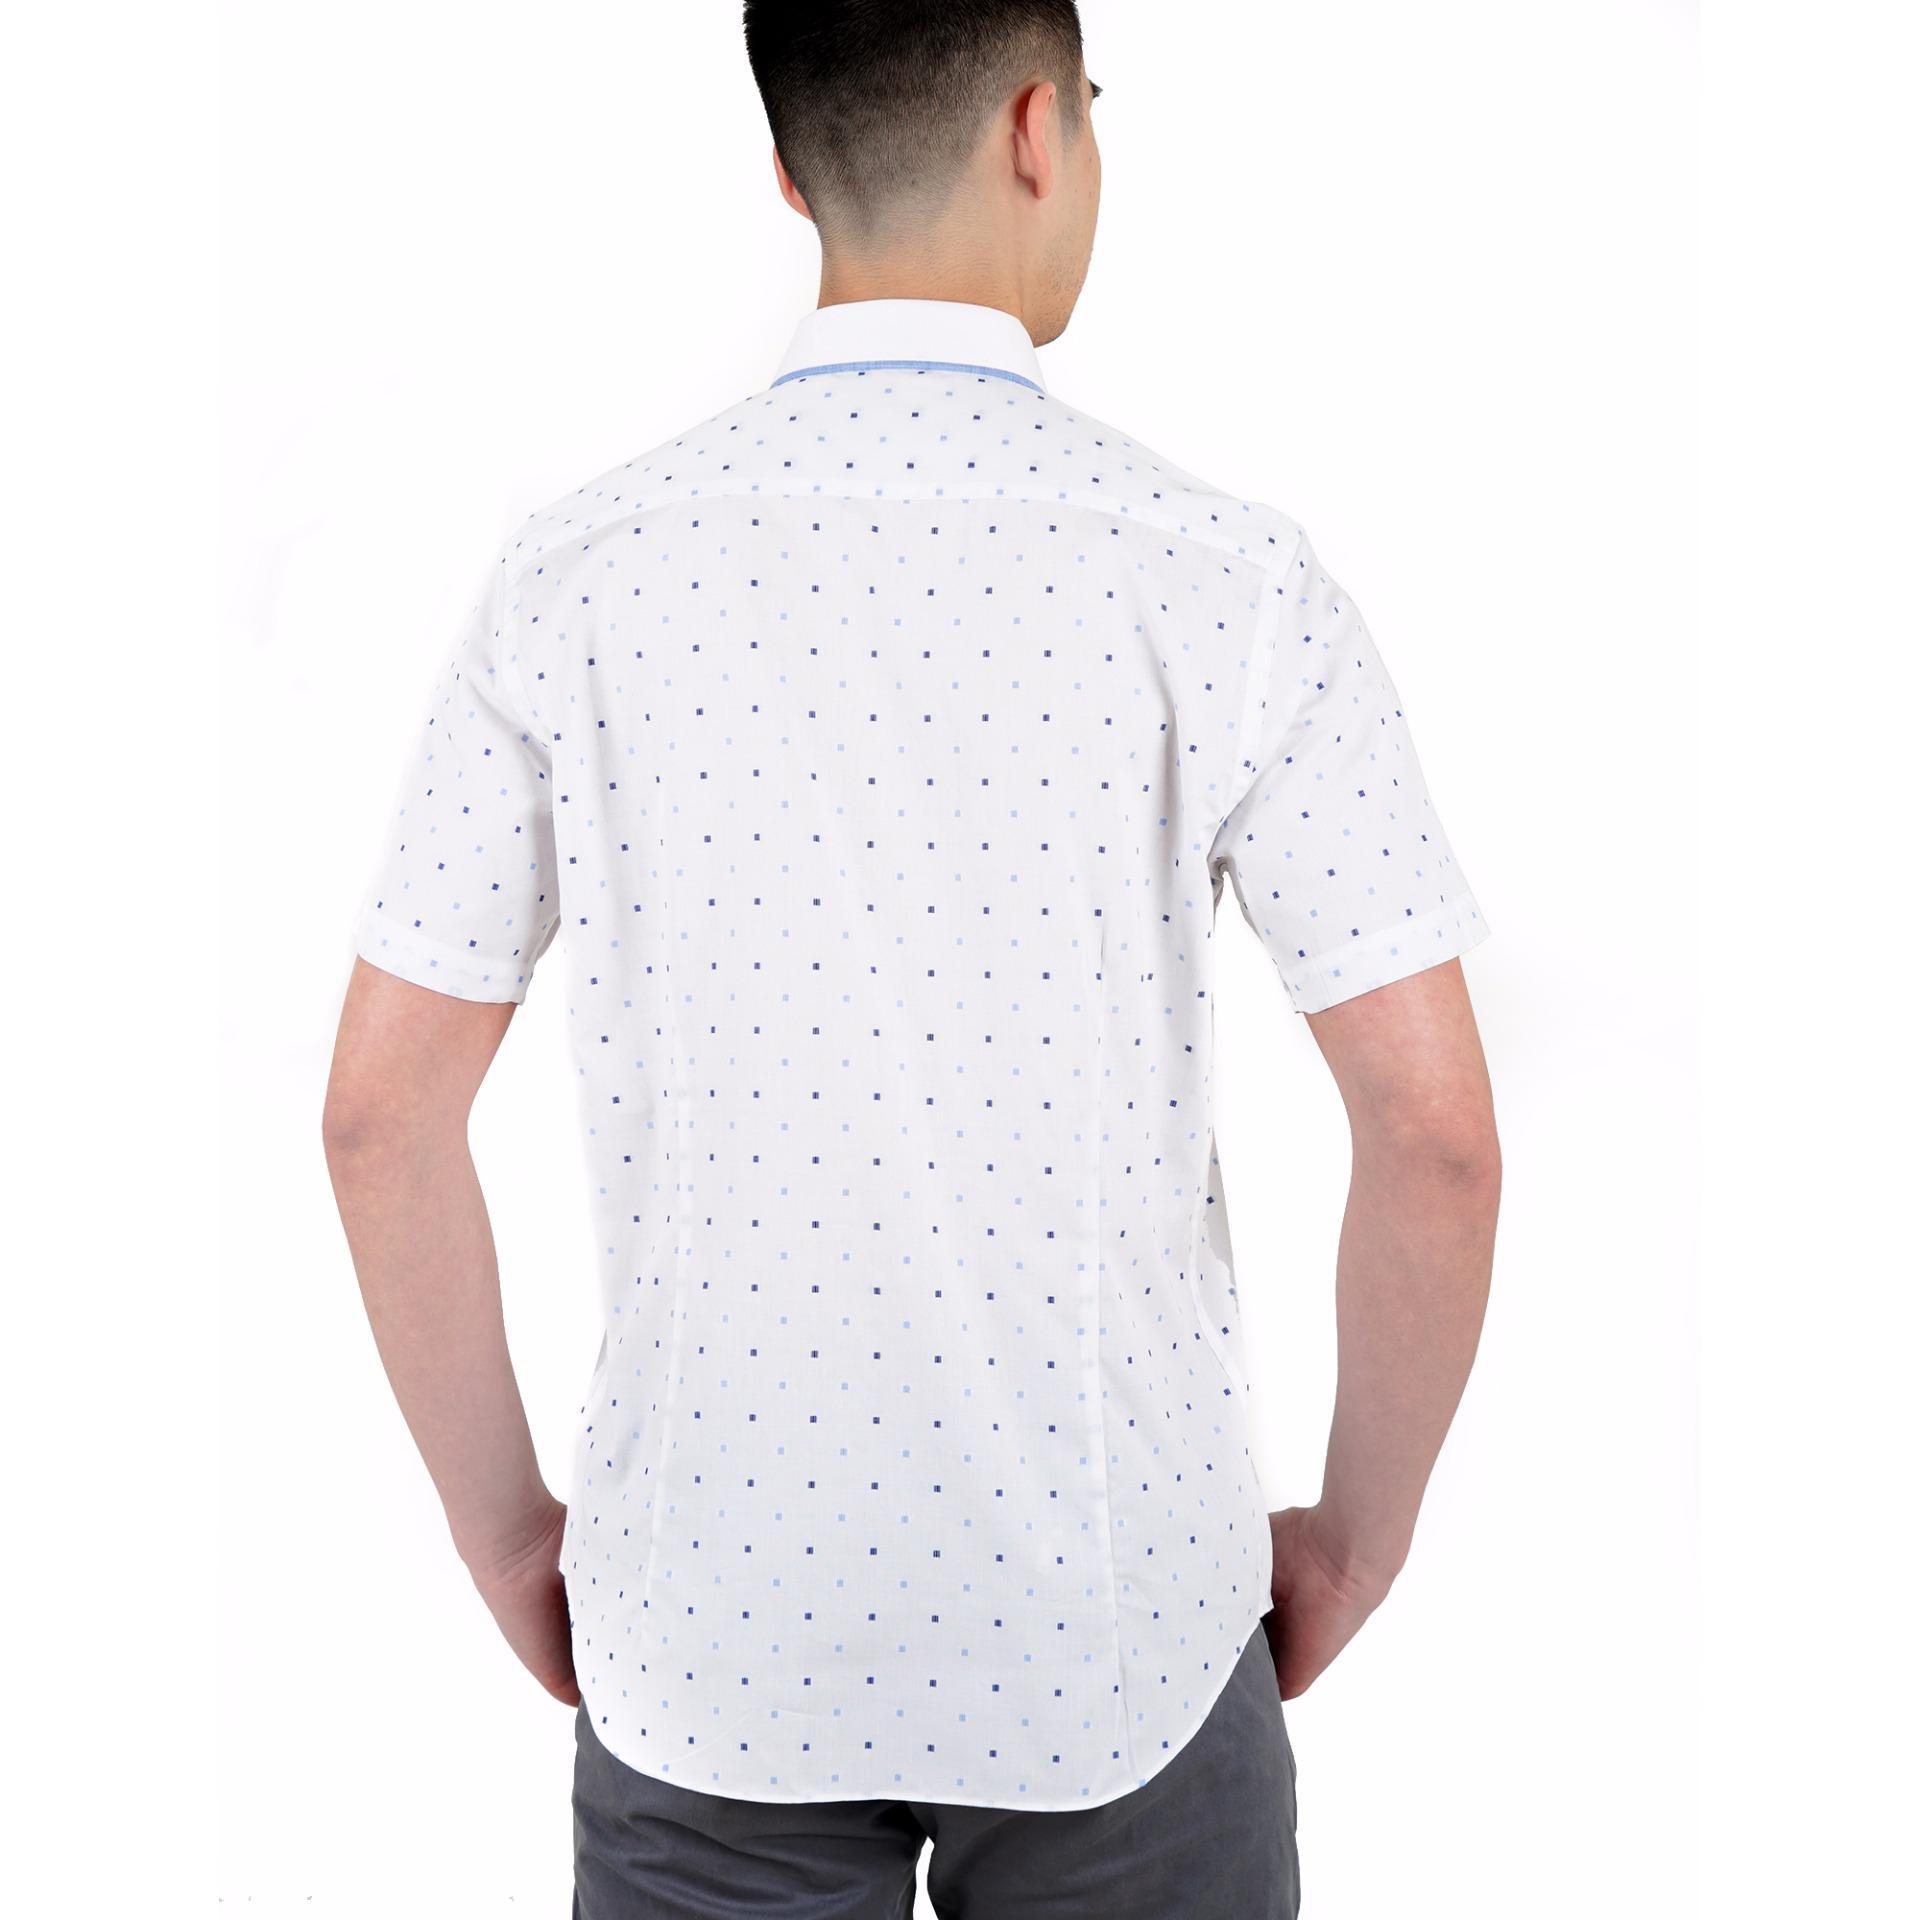 Baju Pria Crocodile Men Polo Shirt Slim Fit Bahan Katun 100 Cotton Palm Relax White L Kemeja Lengan Pendek